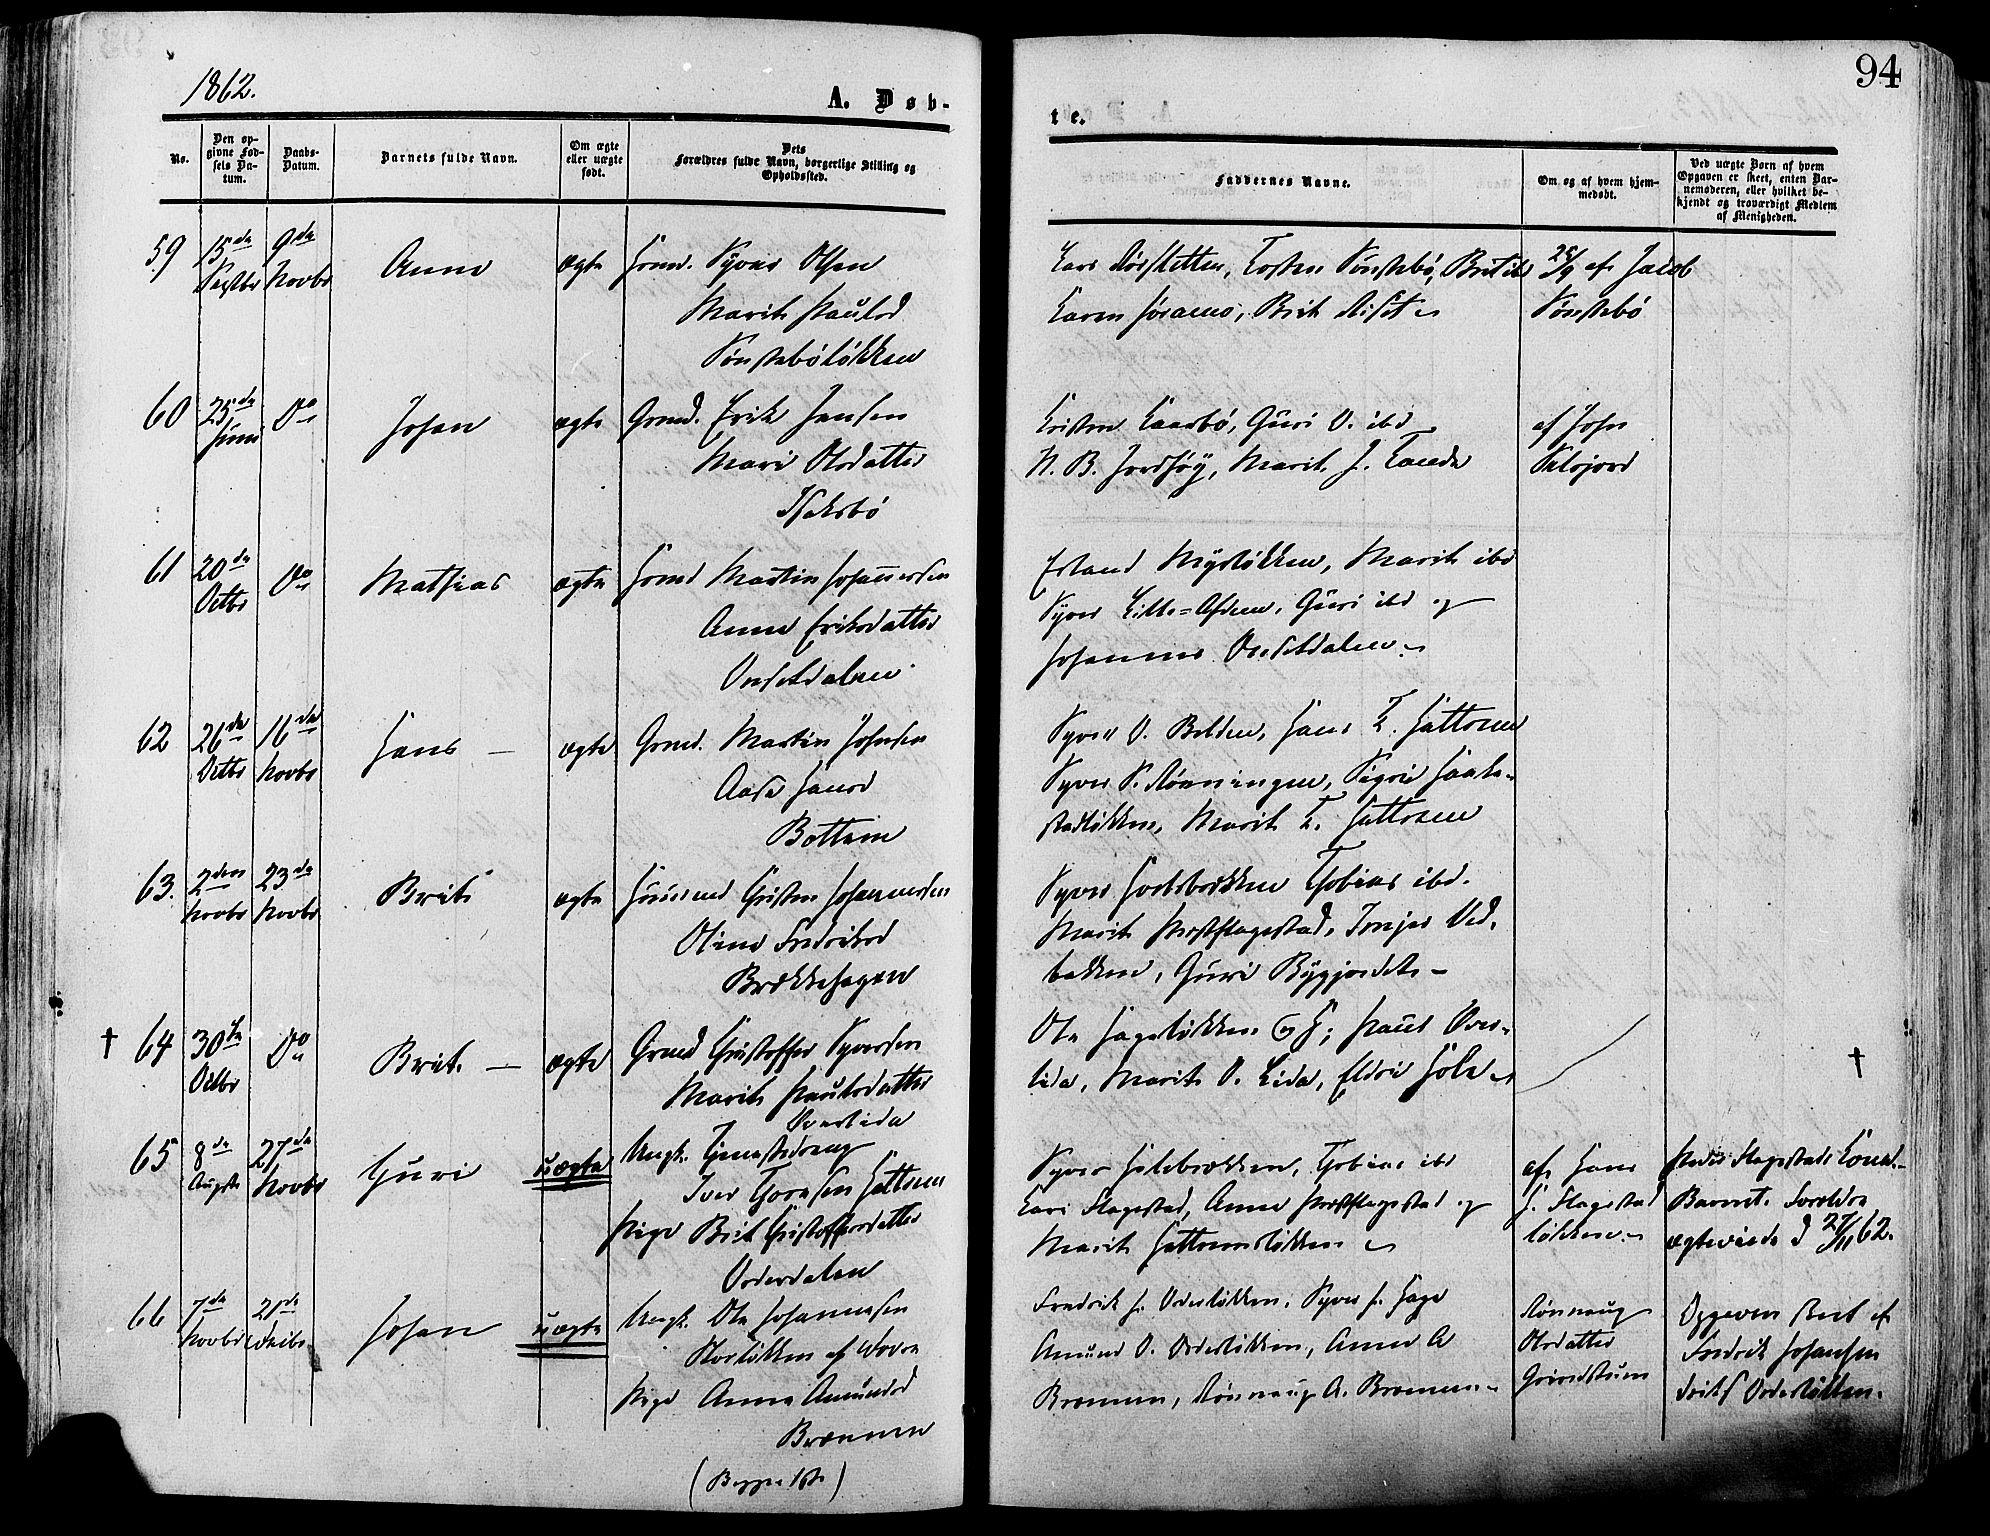 SAH, Lesja prestekontor, Ministerialbok nr. 8, 1854-1880, s. 94